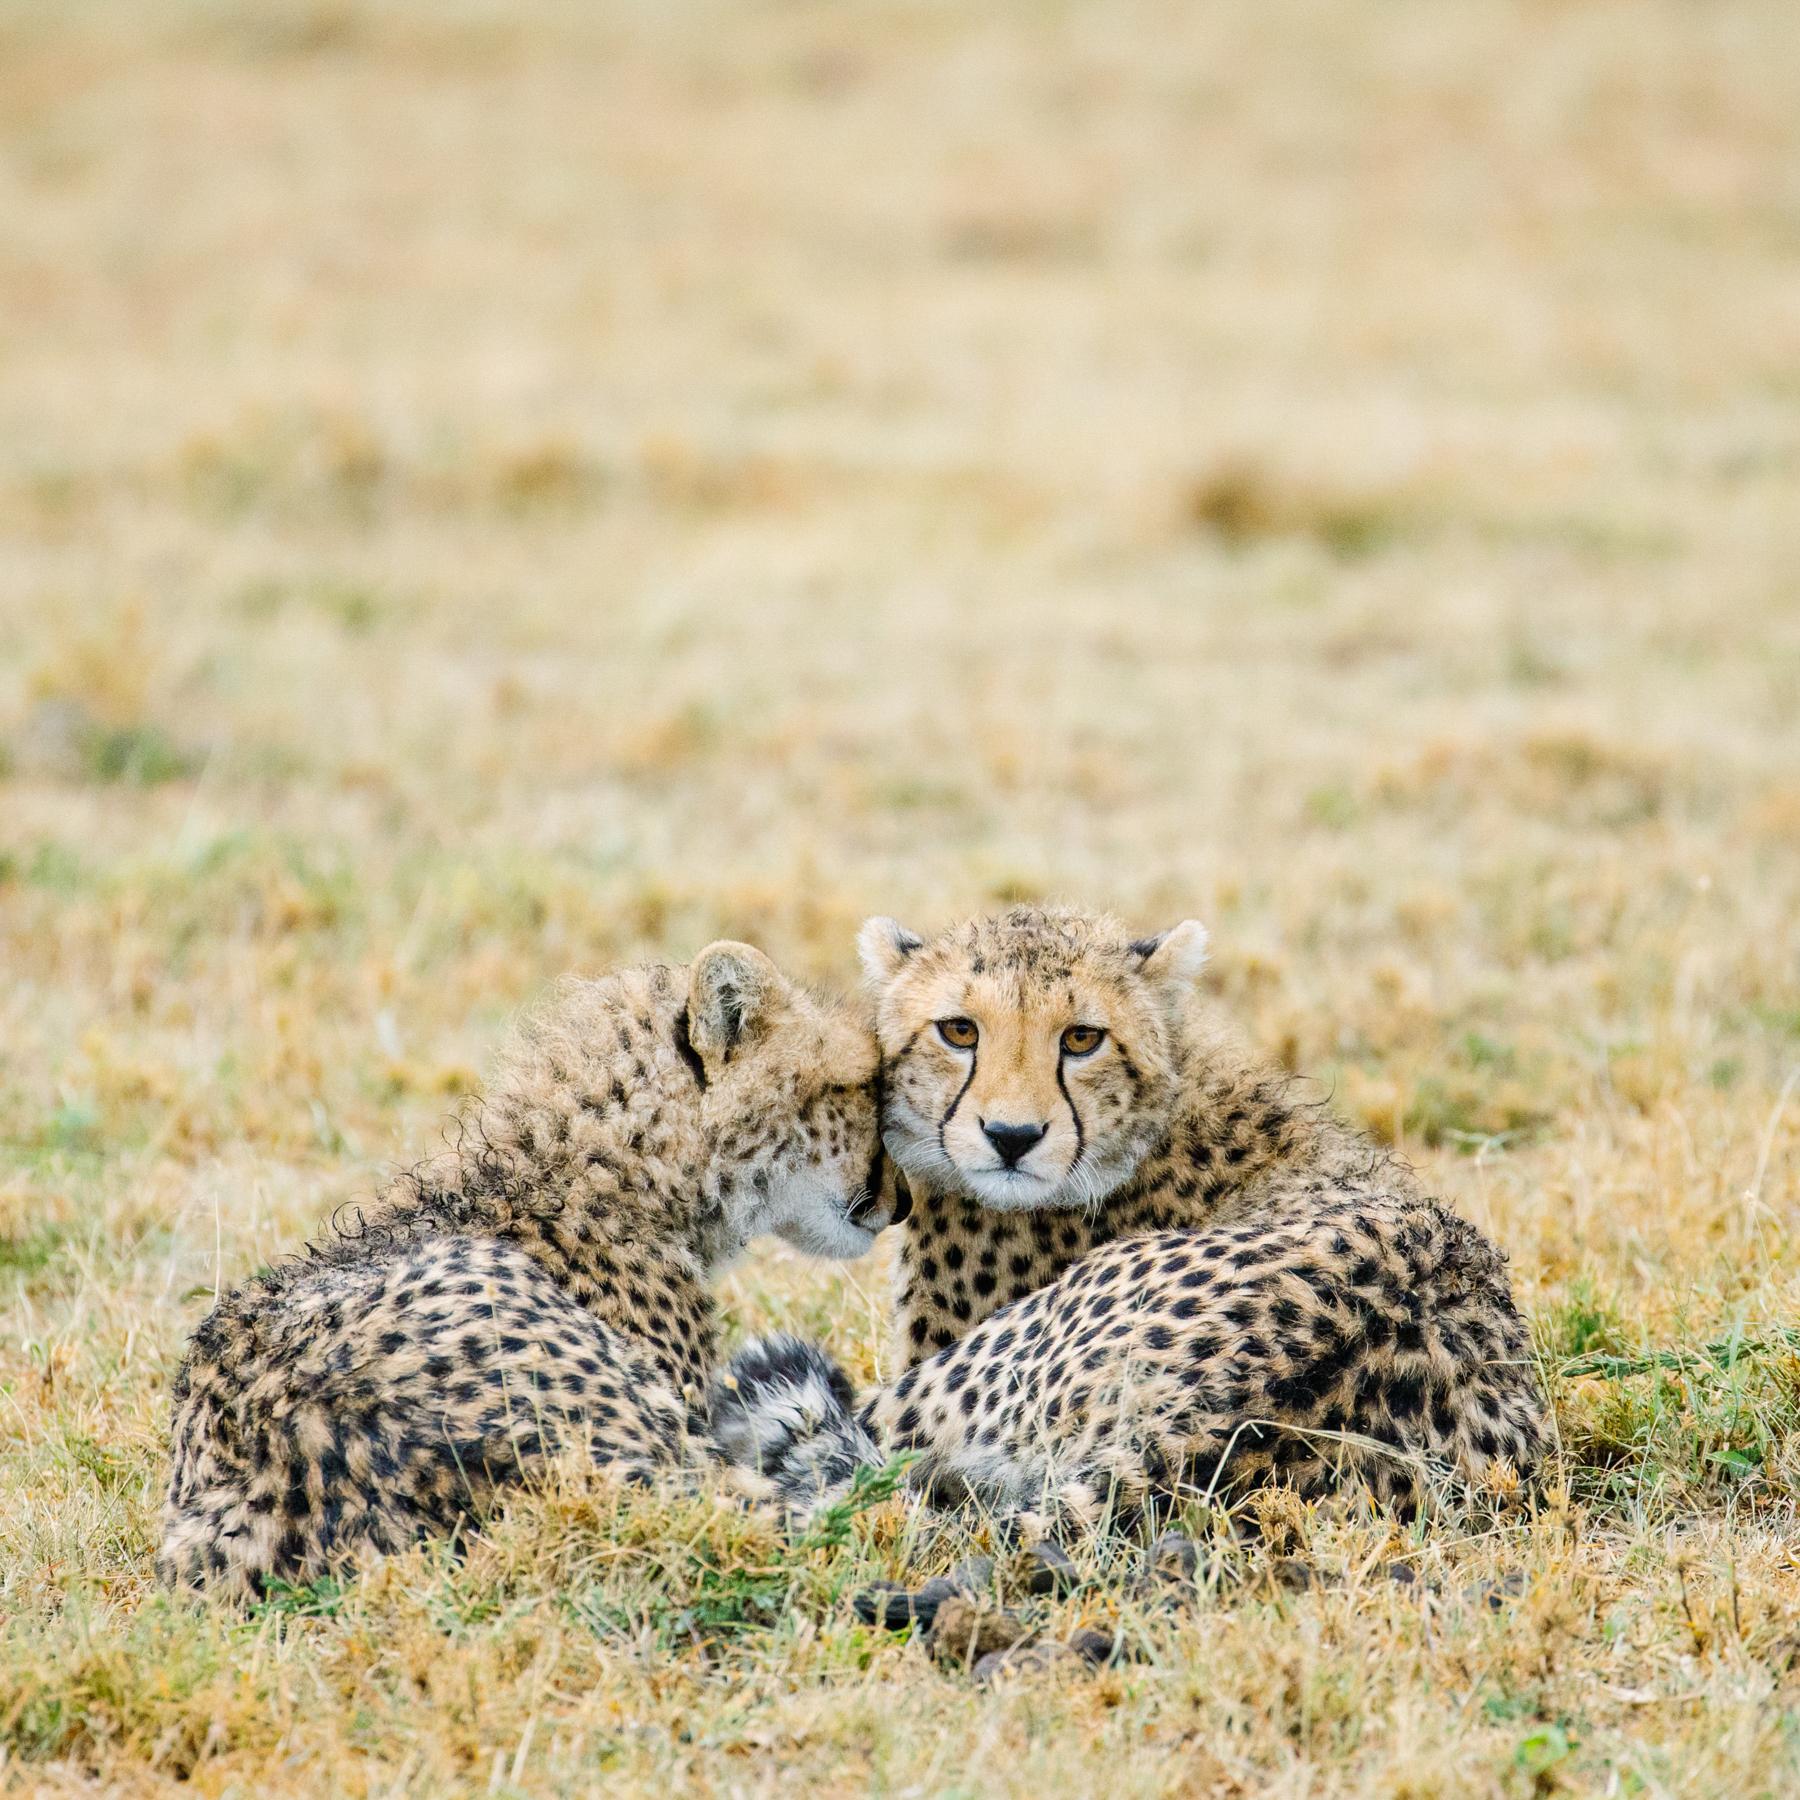 KenyaFeb2019_Safari-148.jpg